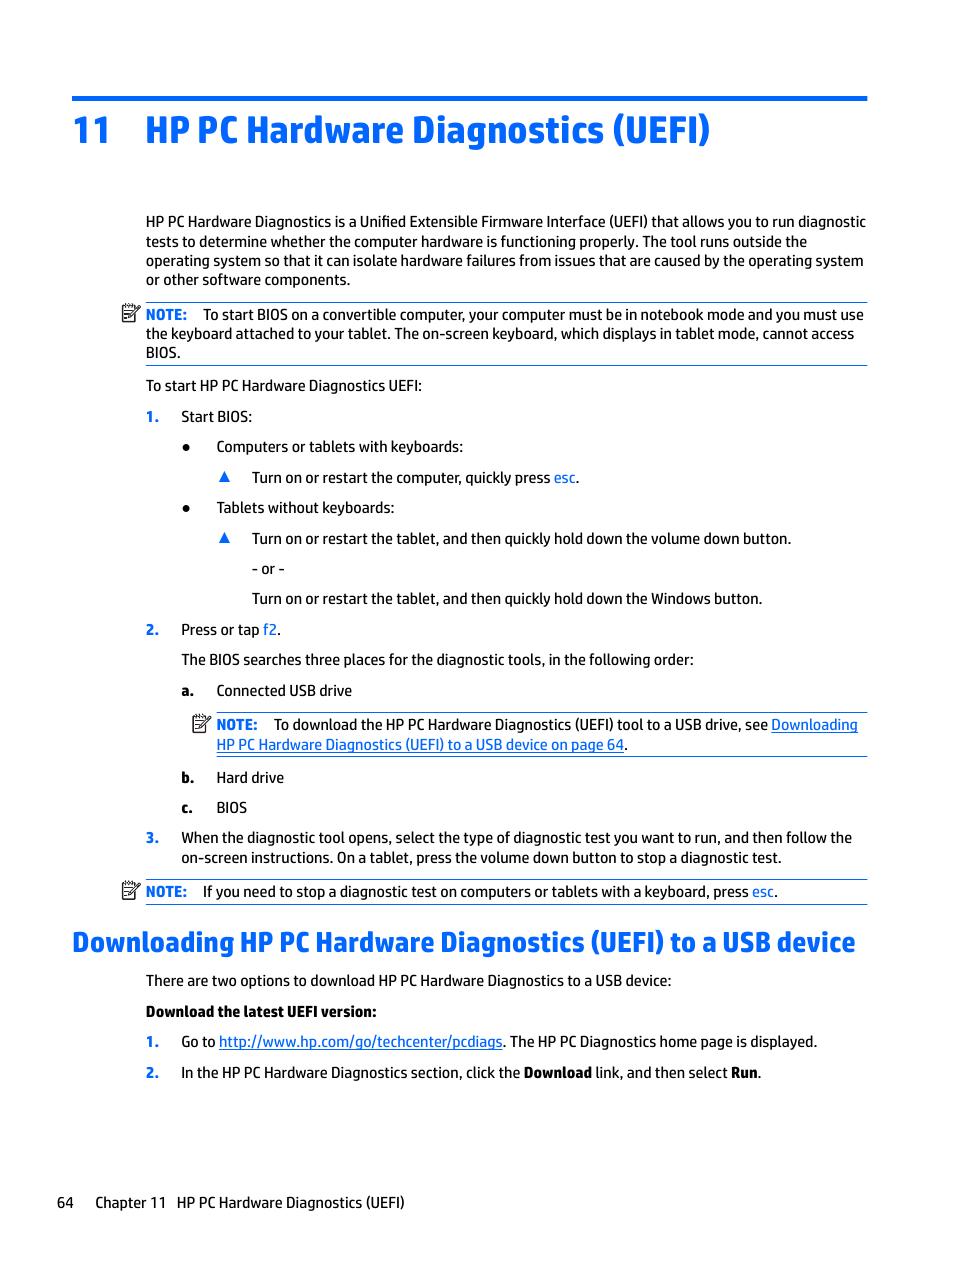 Hp pc hardware diagnostics (uefi), 11 hp pc hardware diagnostics